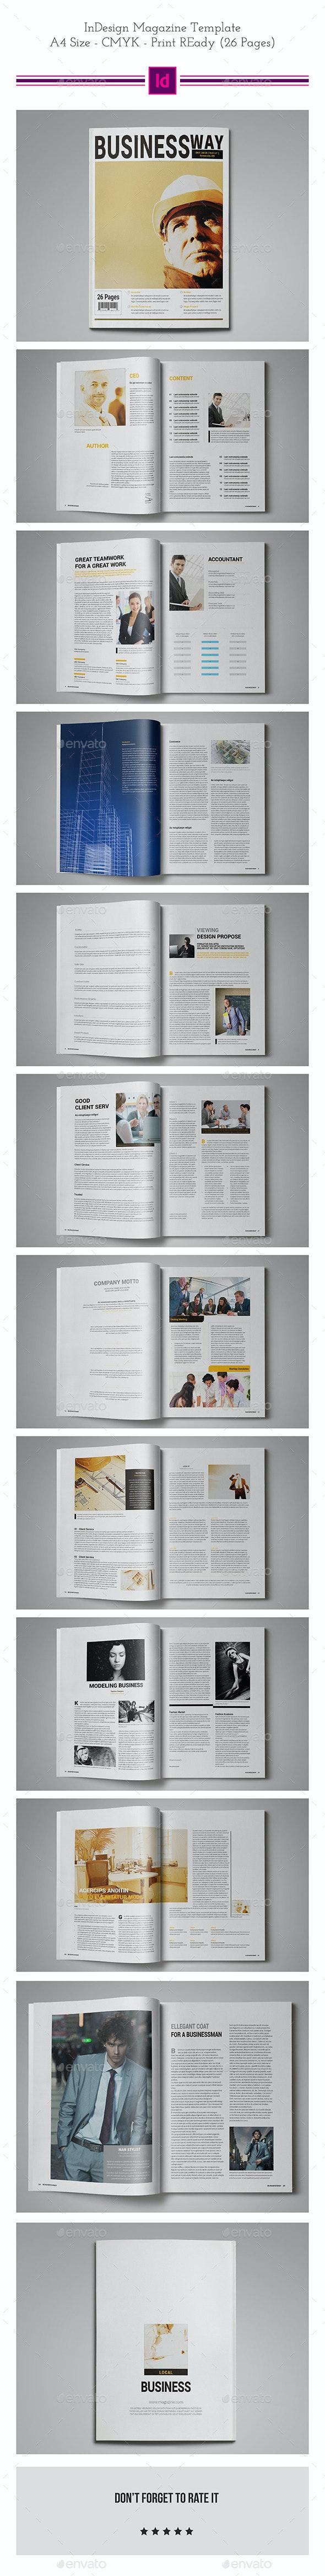 Business Magazine Template - Magazines Print Templates